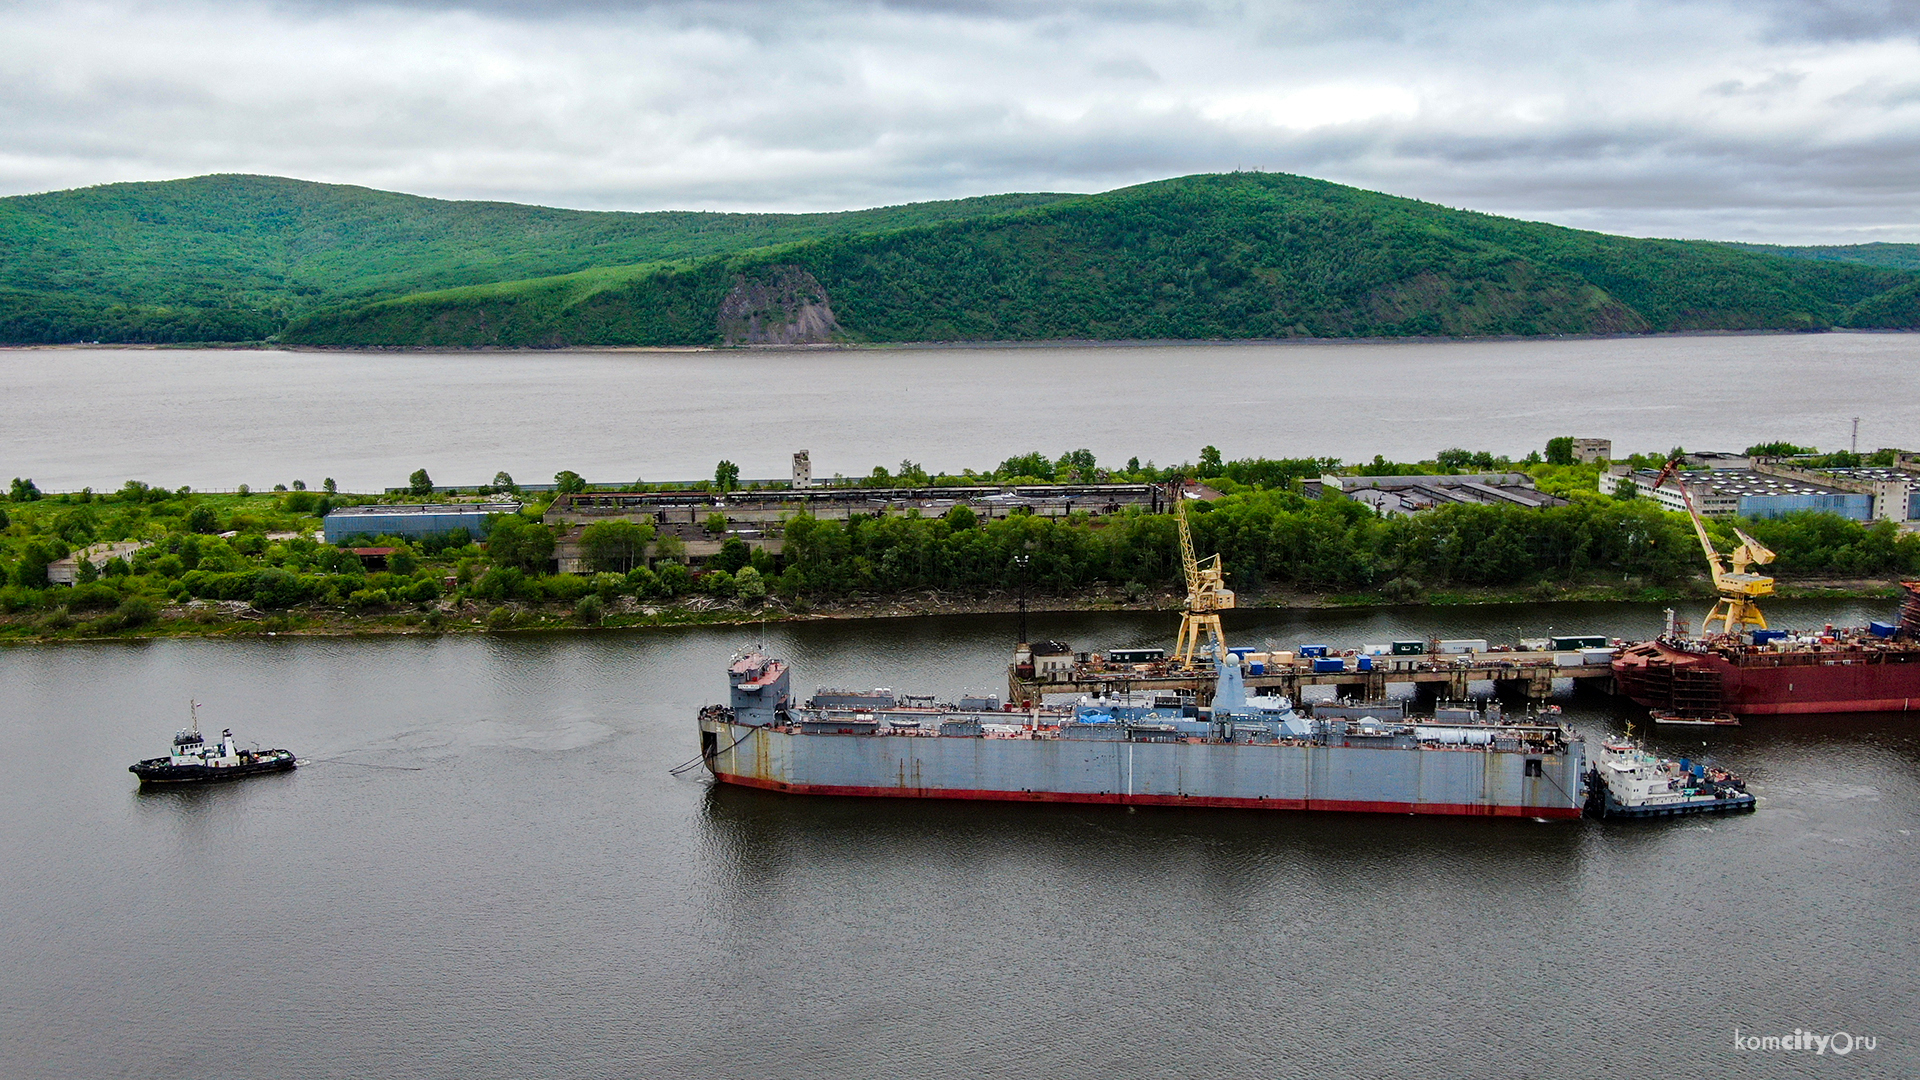 Russian Project 20380 Corvette Transported From Amur Shipyard To Vladivostok Via Floating Transport Dock (Photos)